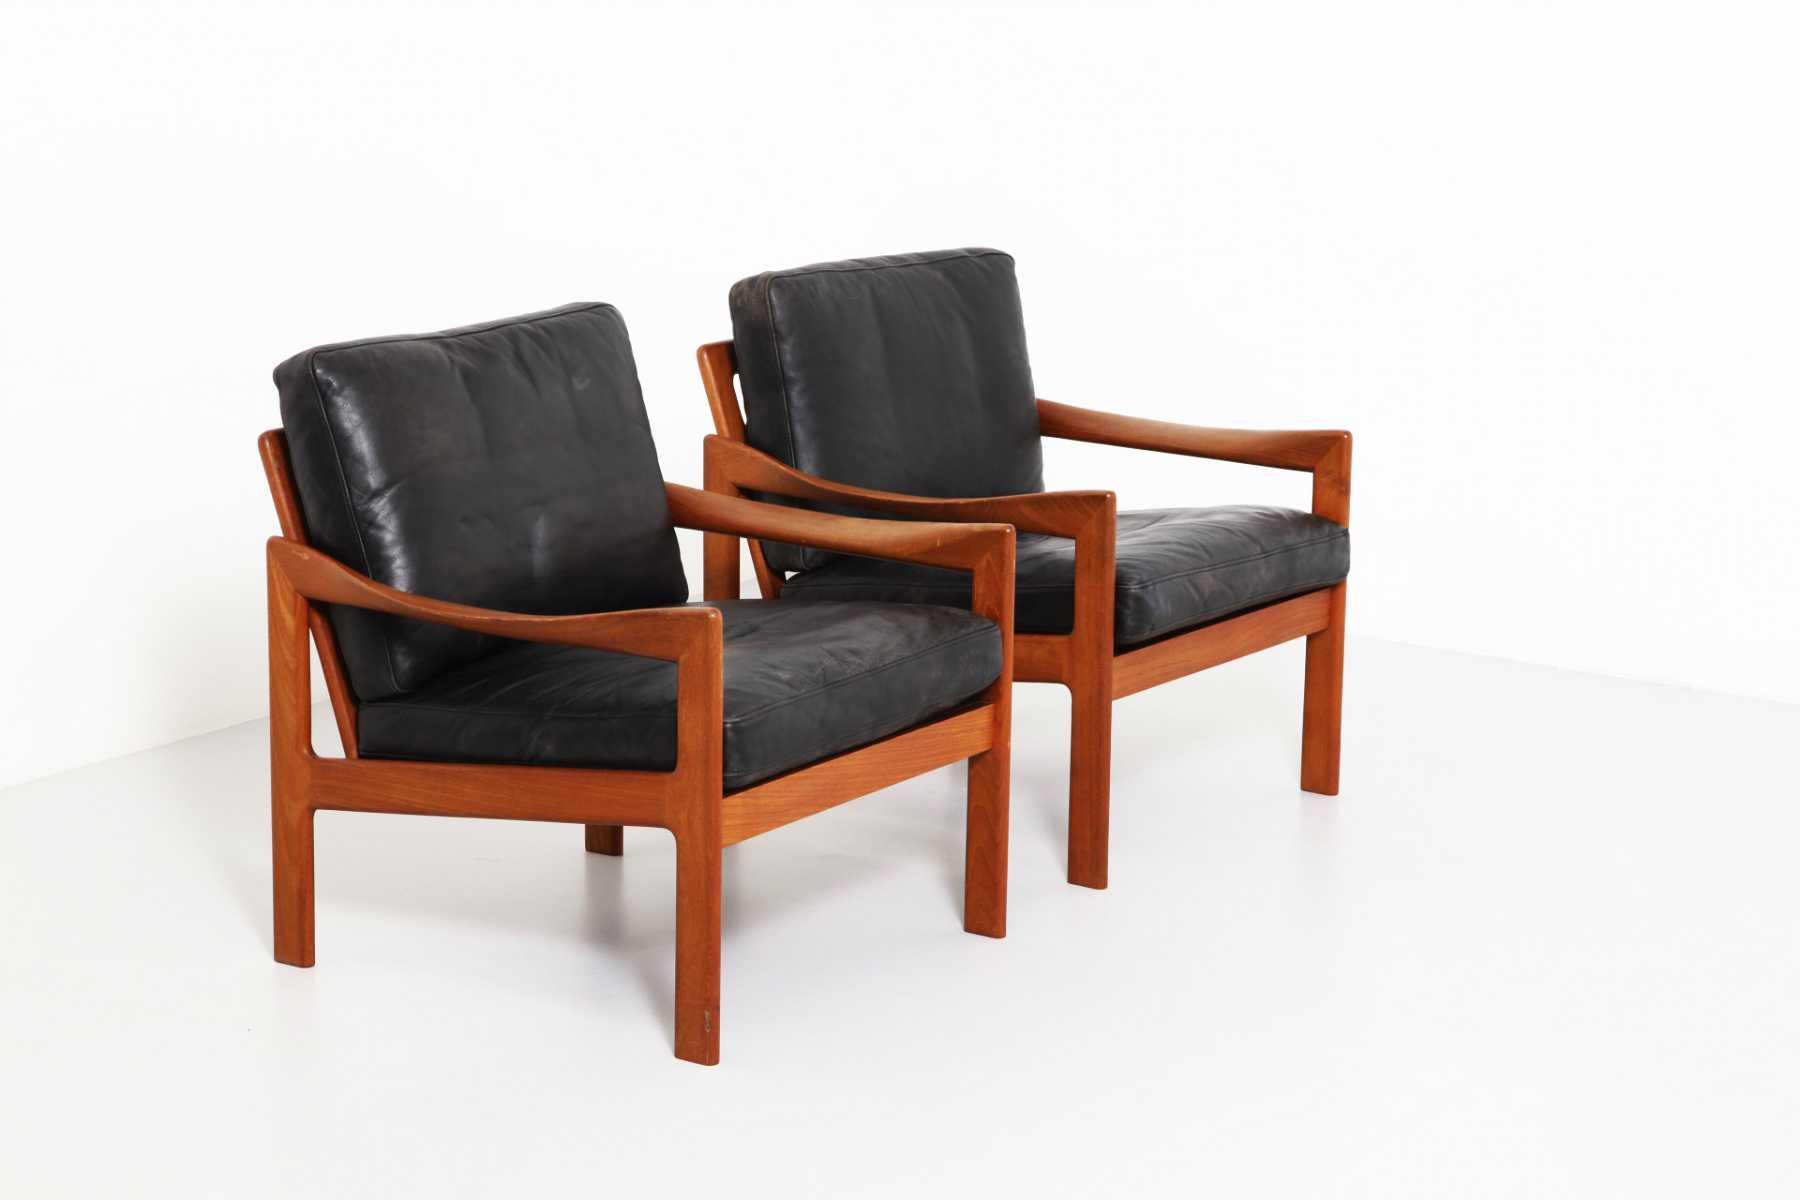 illum wikkelso m bel online bei pamono kaufen. Black Bedroom Furniture Sets. Home Design Ideas